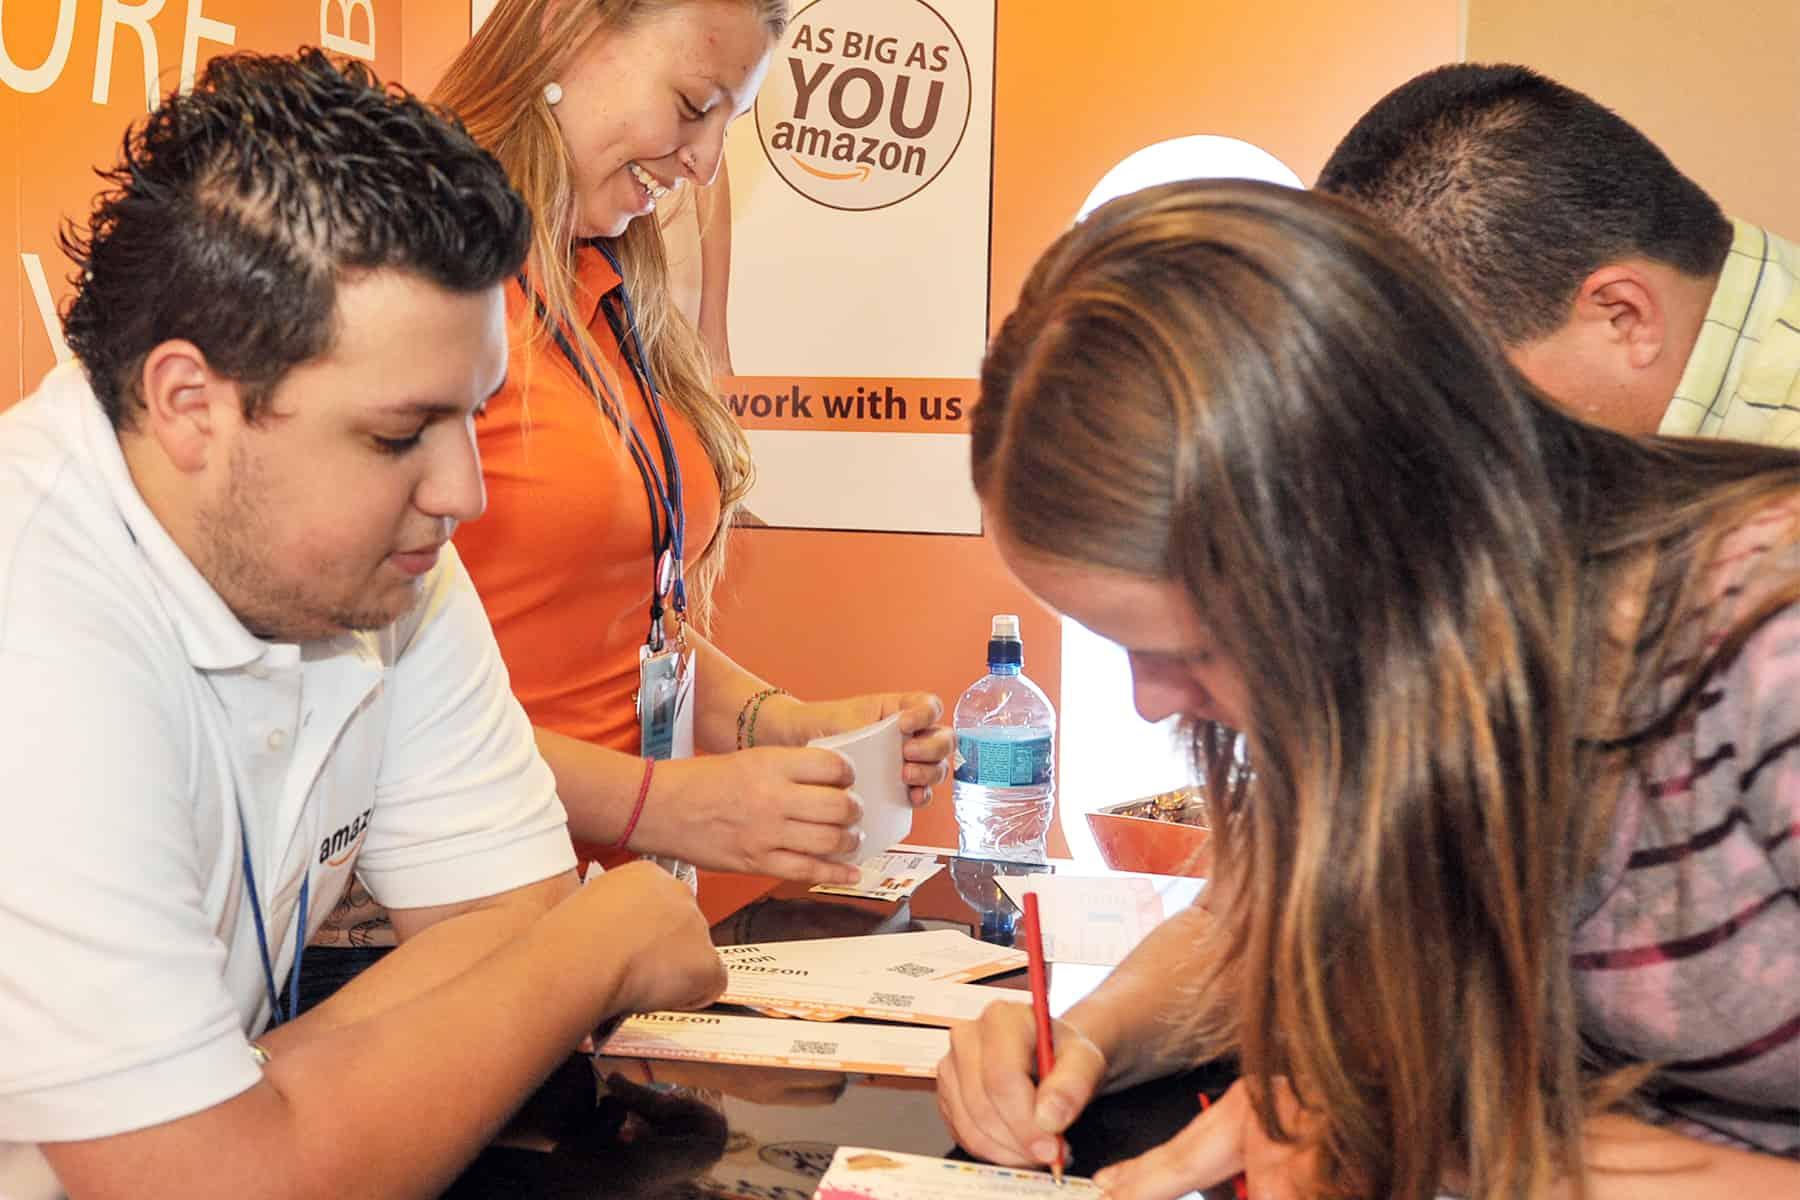 Amazon job fair in Costa Rica